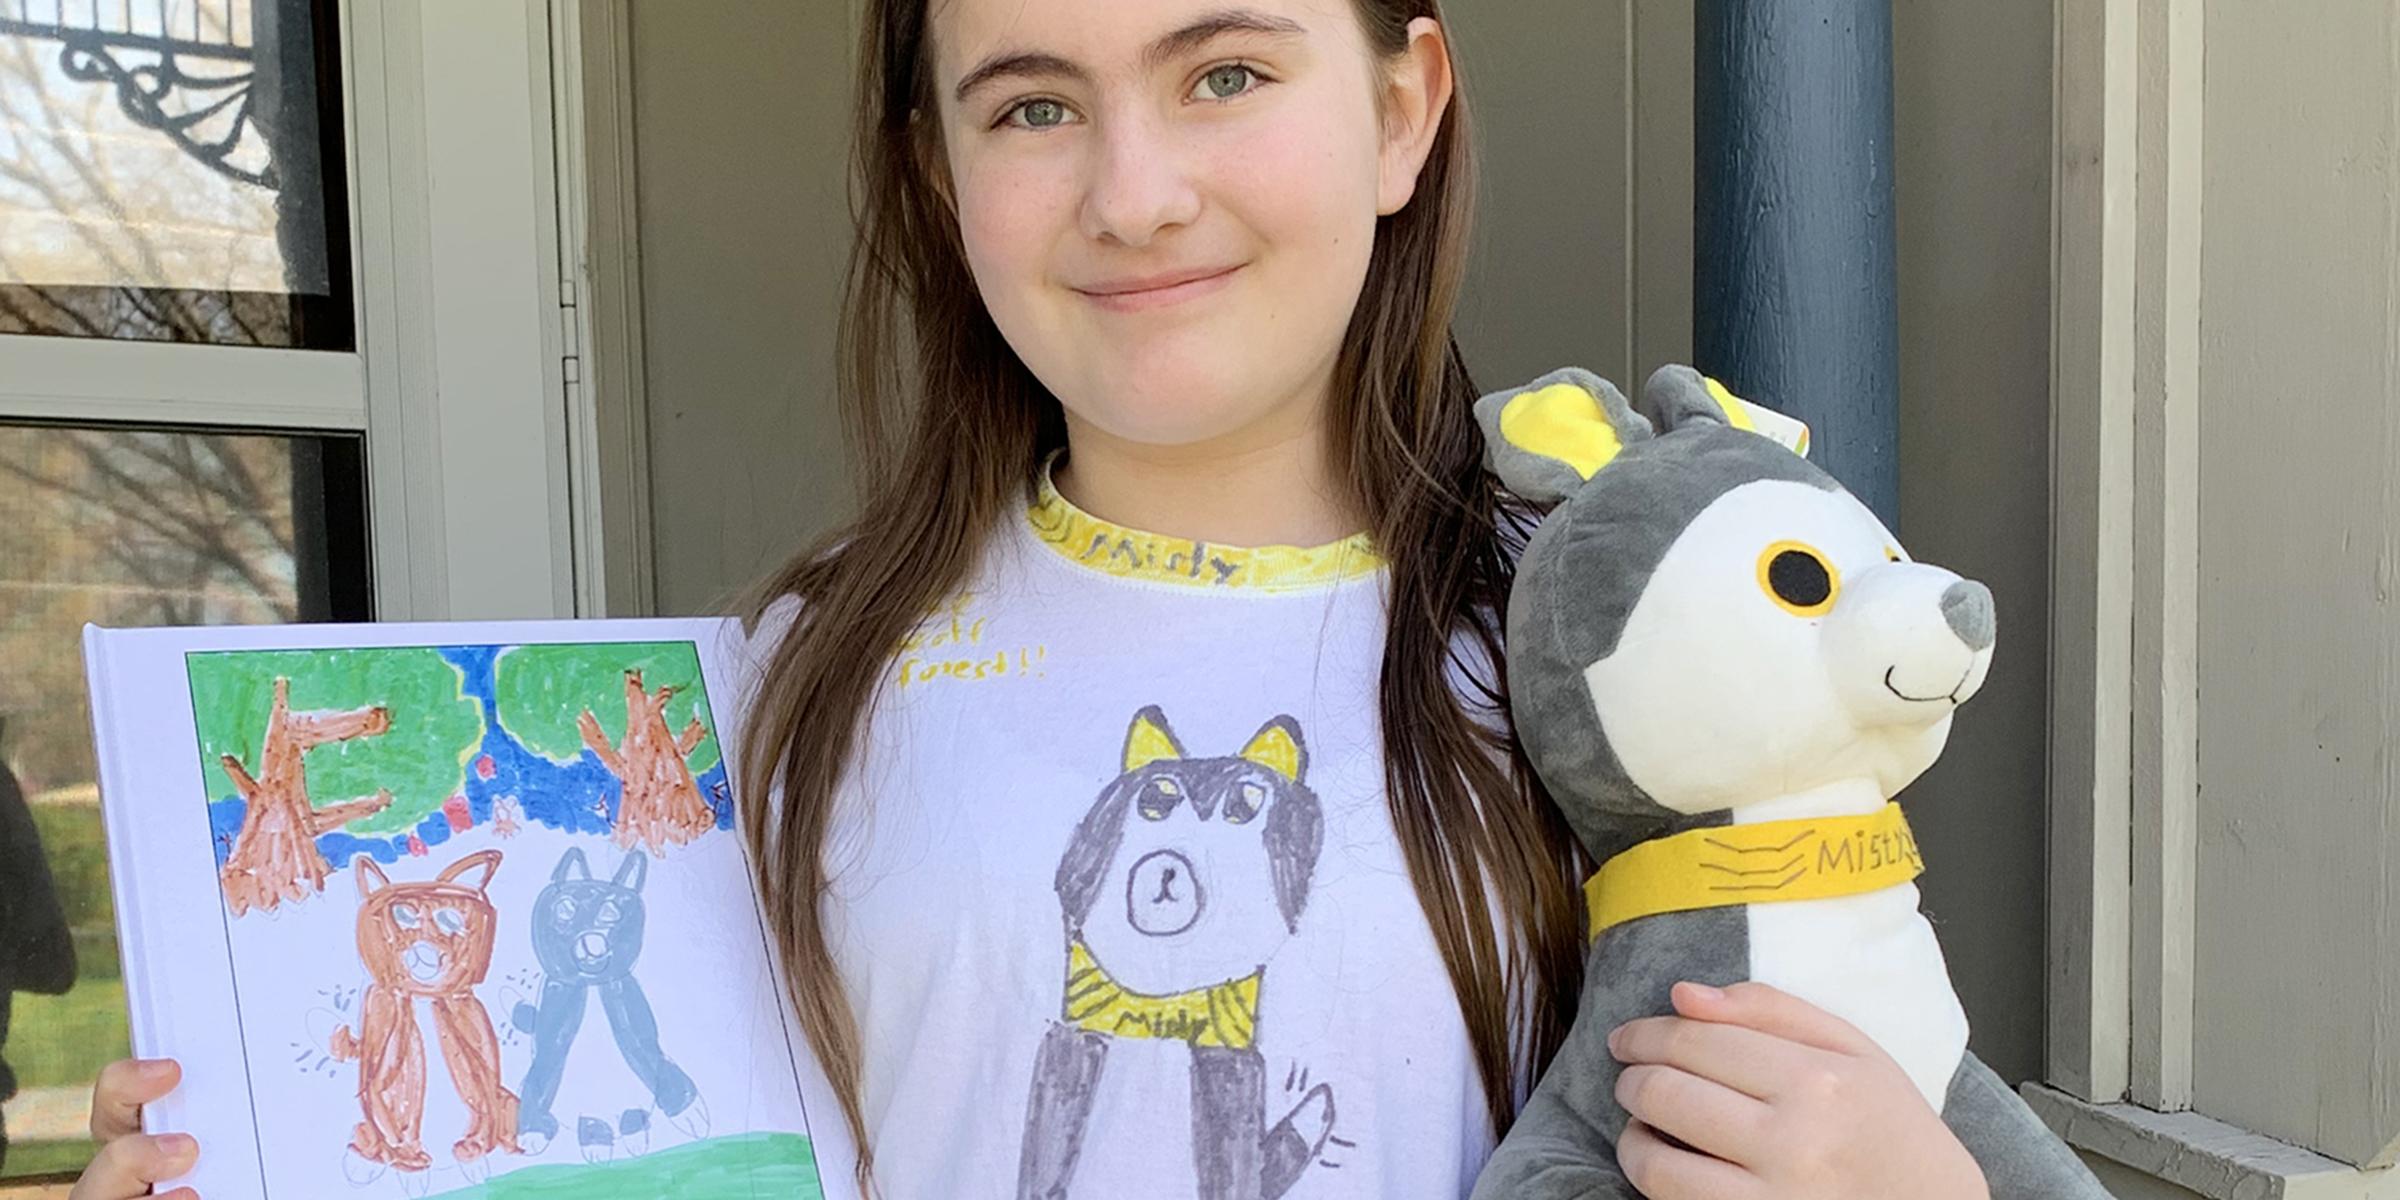 Brittany Stuffed Animal, Grade School Teacher Turns Student Art Into Stuffed Animals